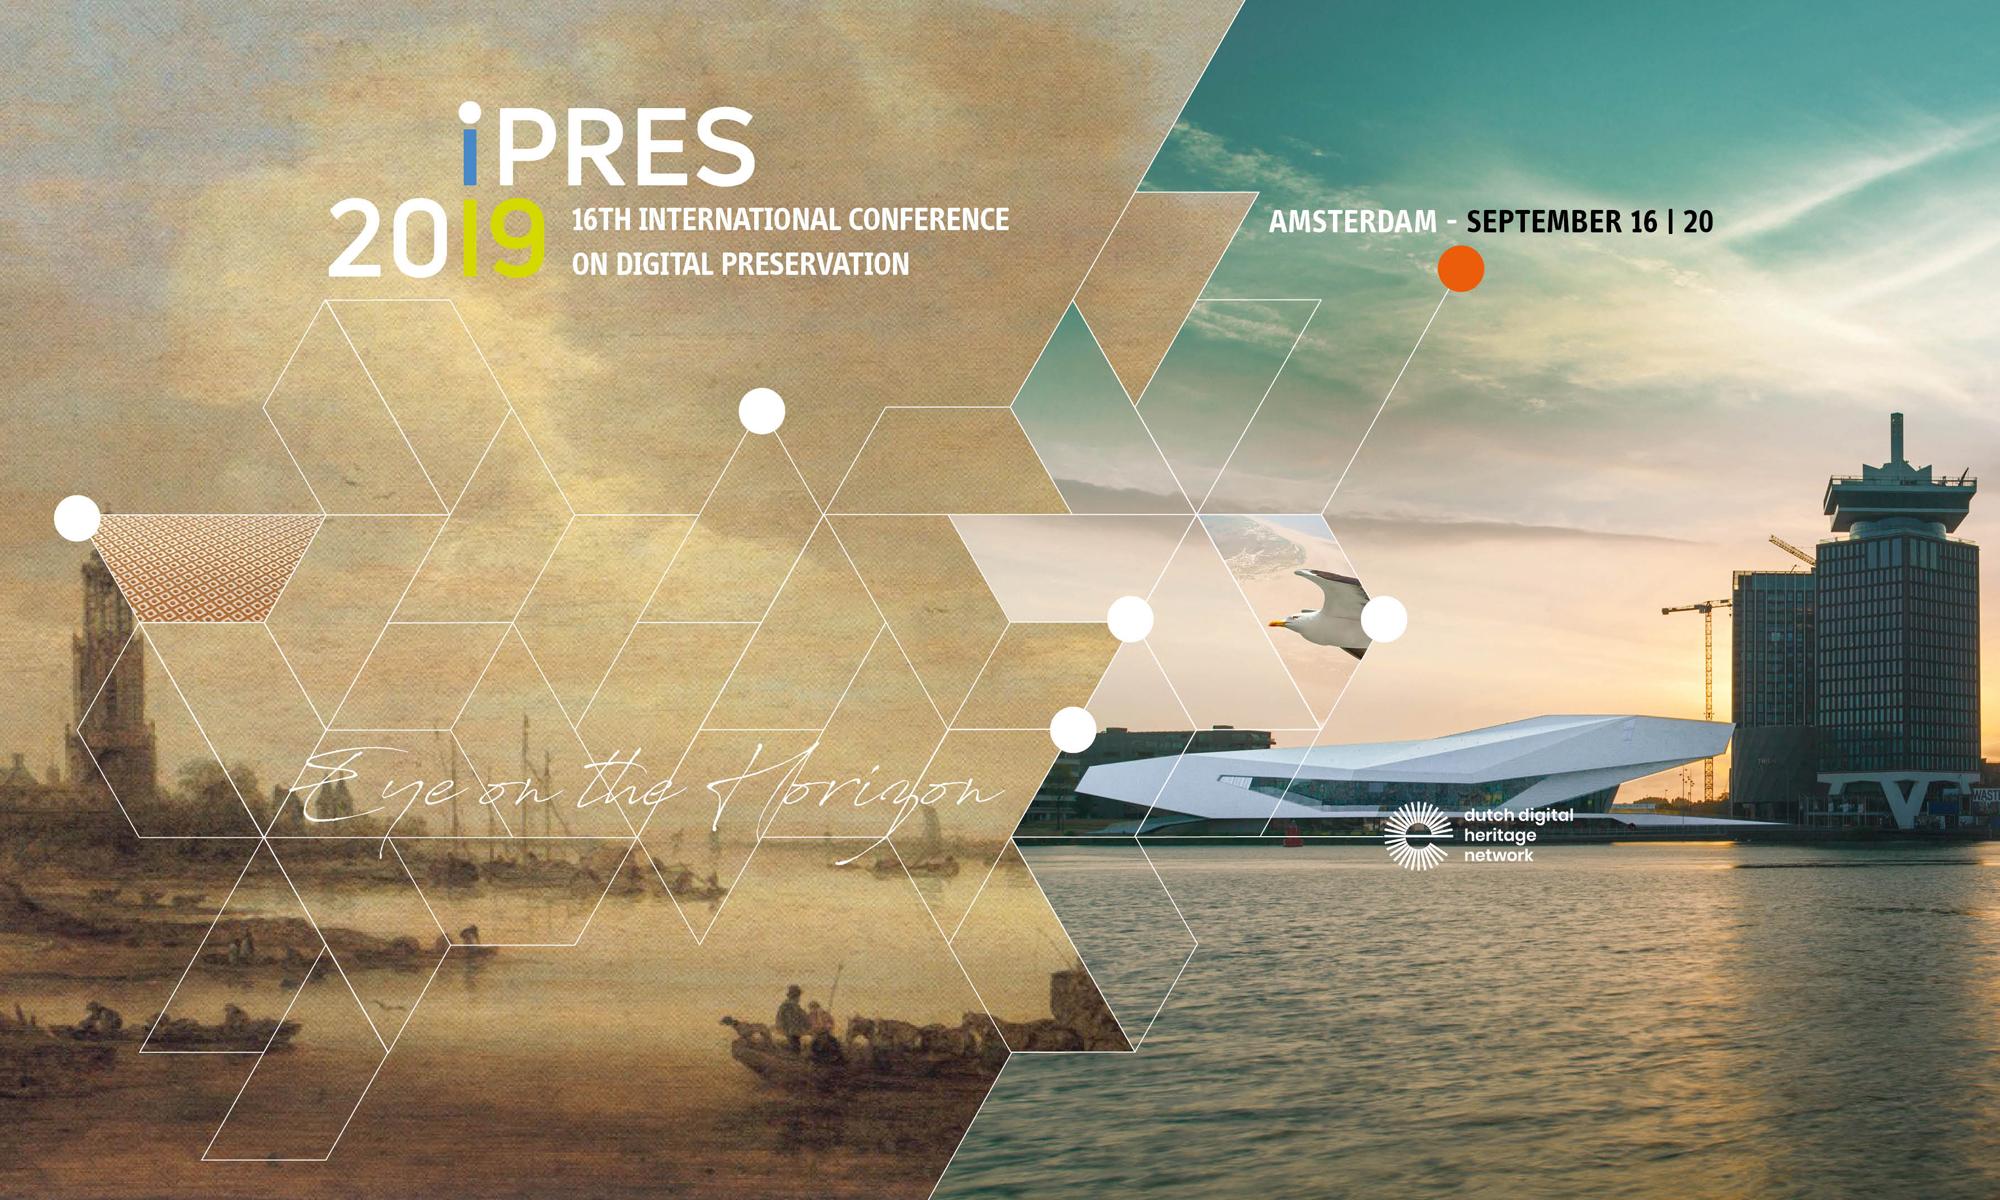 iPRES2019 | Amsterdam, September 16-20 2019